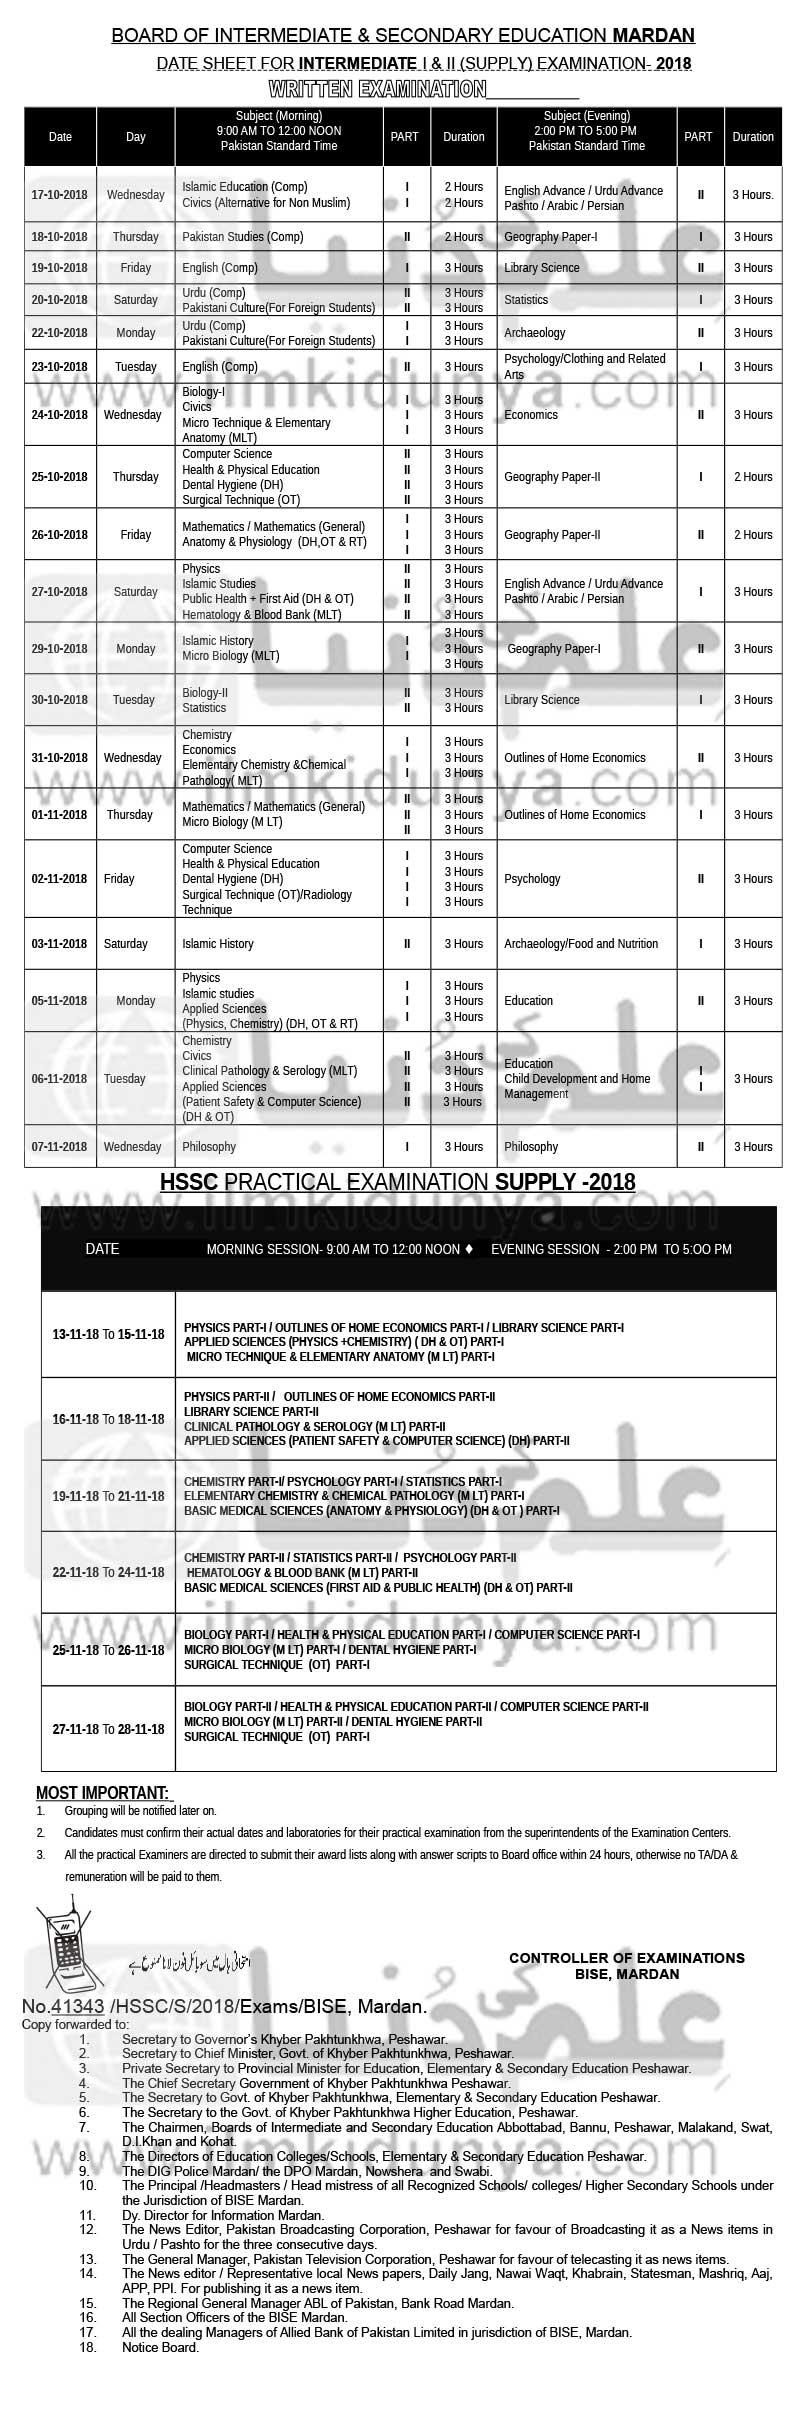 BISE Mardan Board ICom Date Sheet 2019 Part 1, 2